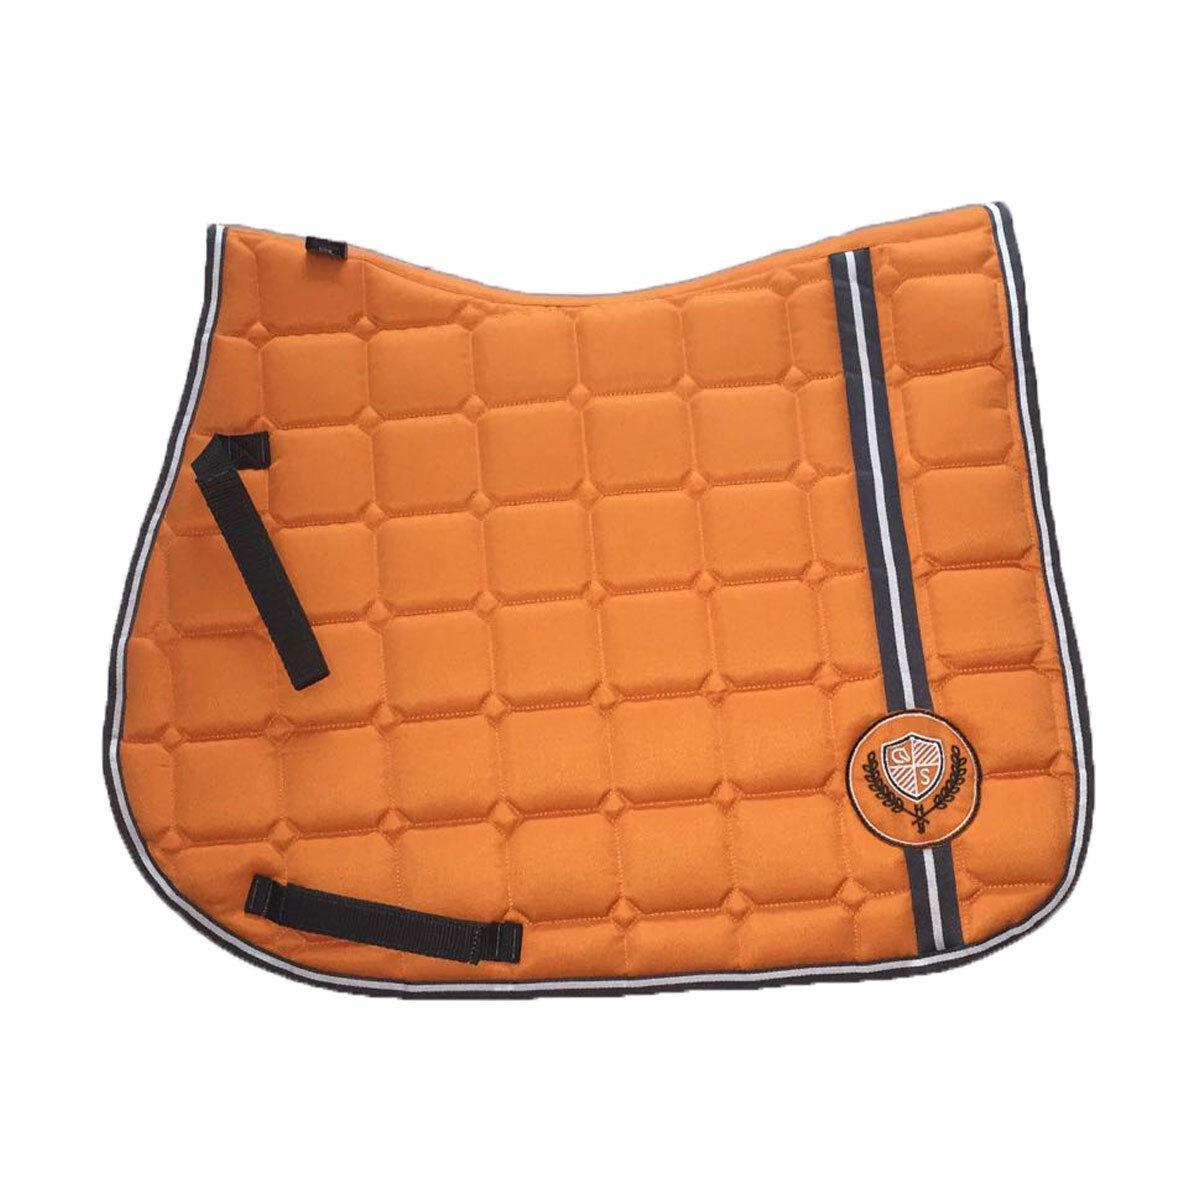 COLDSTREAM orange SADDLE CLOTH PAD PONY COB OR COB FULL